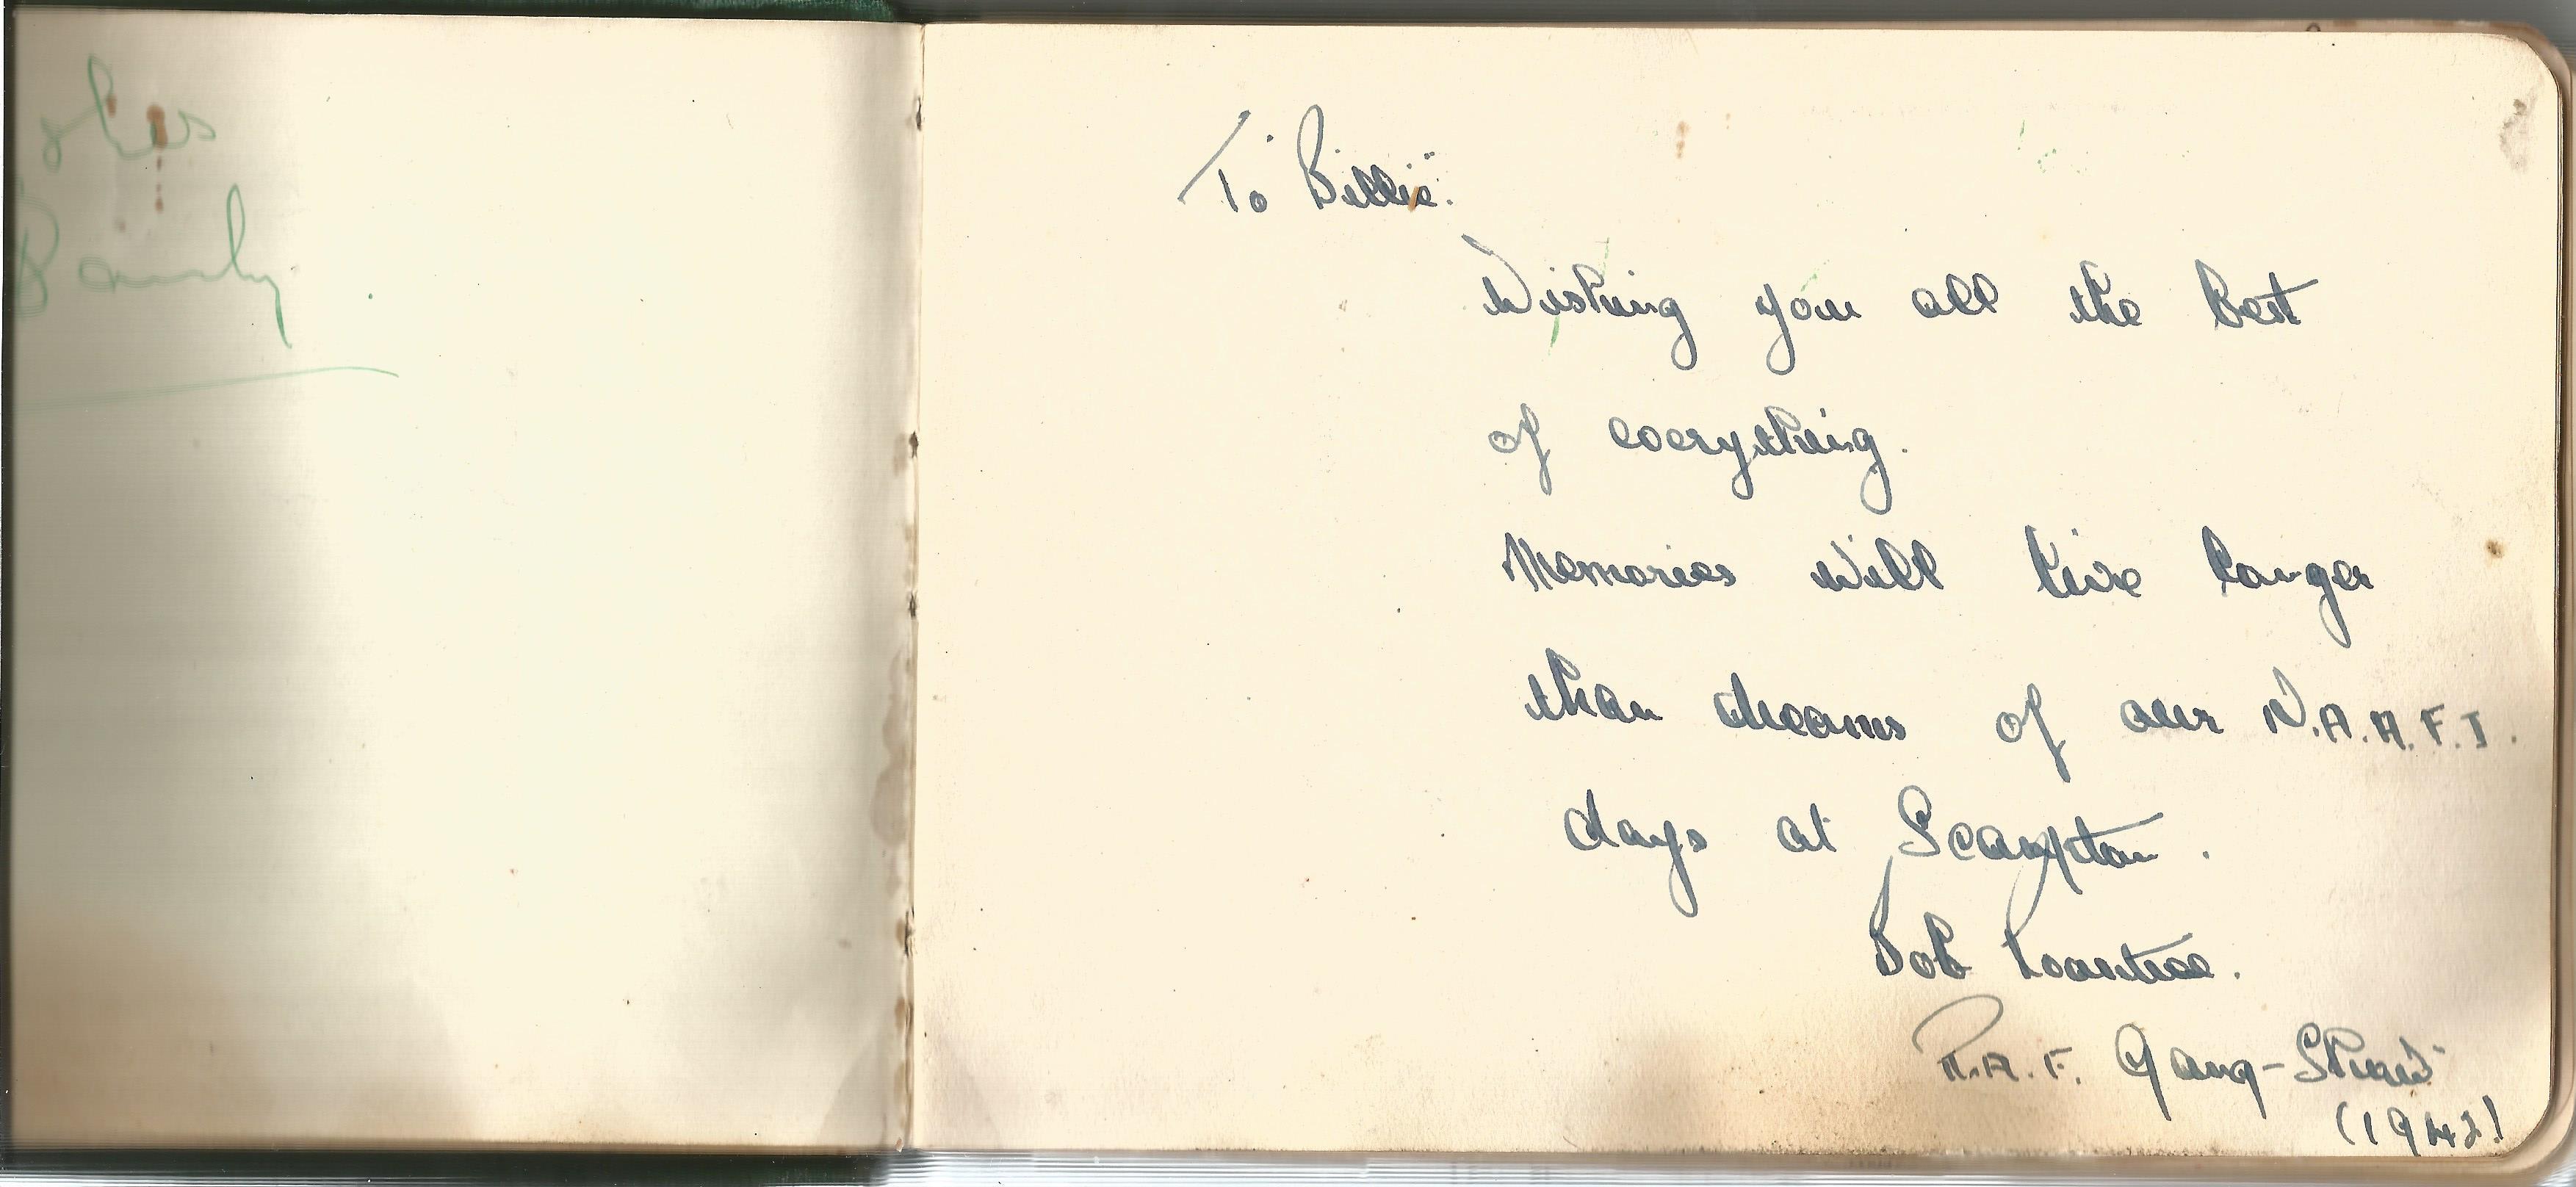 RAF Scampton. 1940-43. Autograph Album. 19cm wide x 13cm tall. Green cloth. Over 250 signatures. - Image 3 of 6